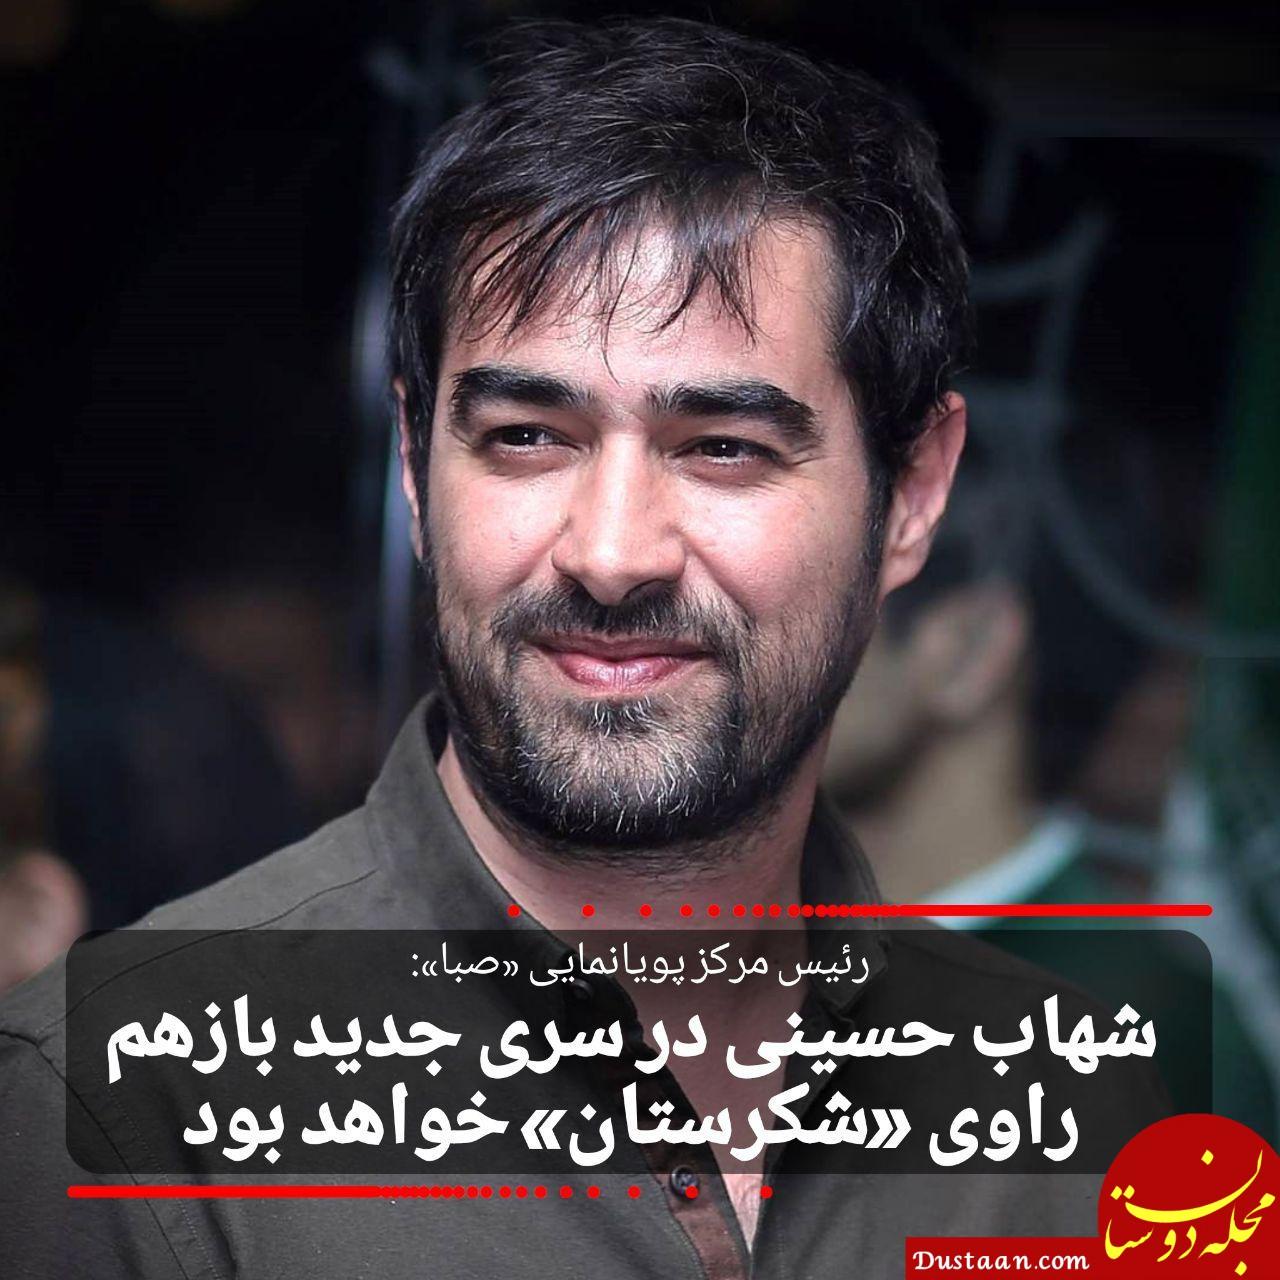 www.dustaan.com در سری جدید شهاب حسینی دوباره راوی «شکرستان» خواهد بود